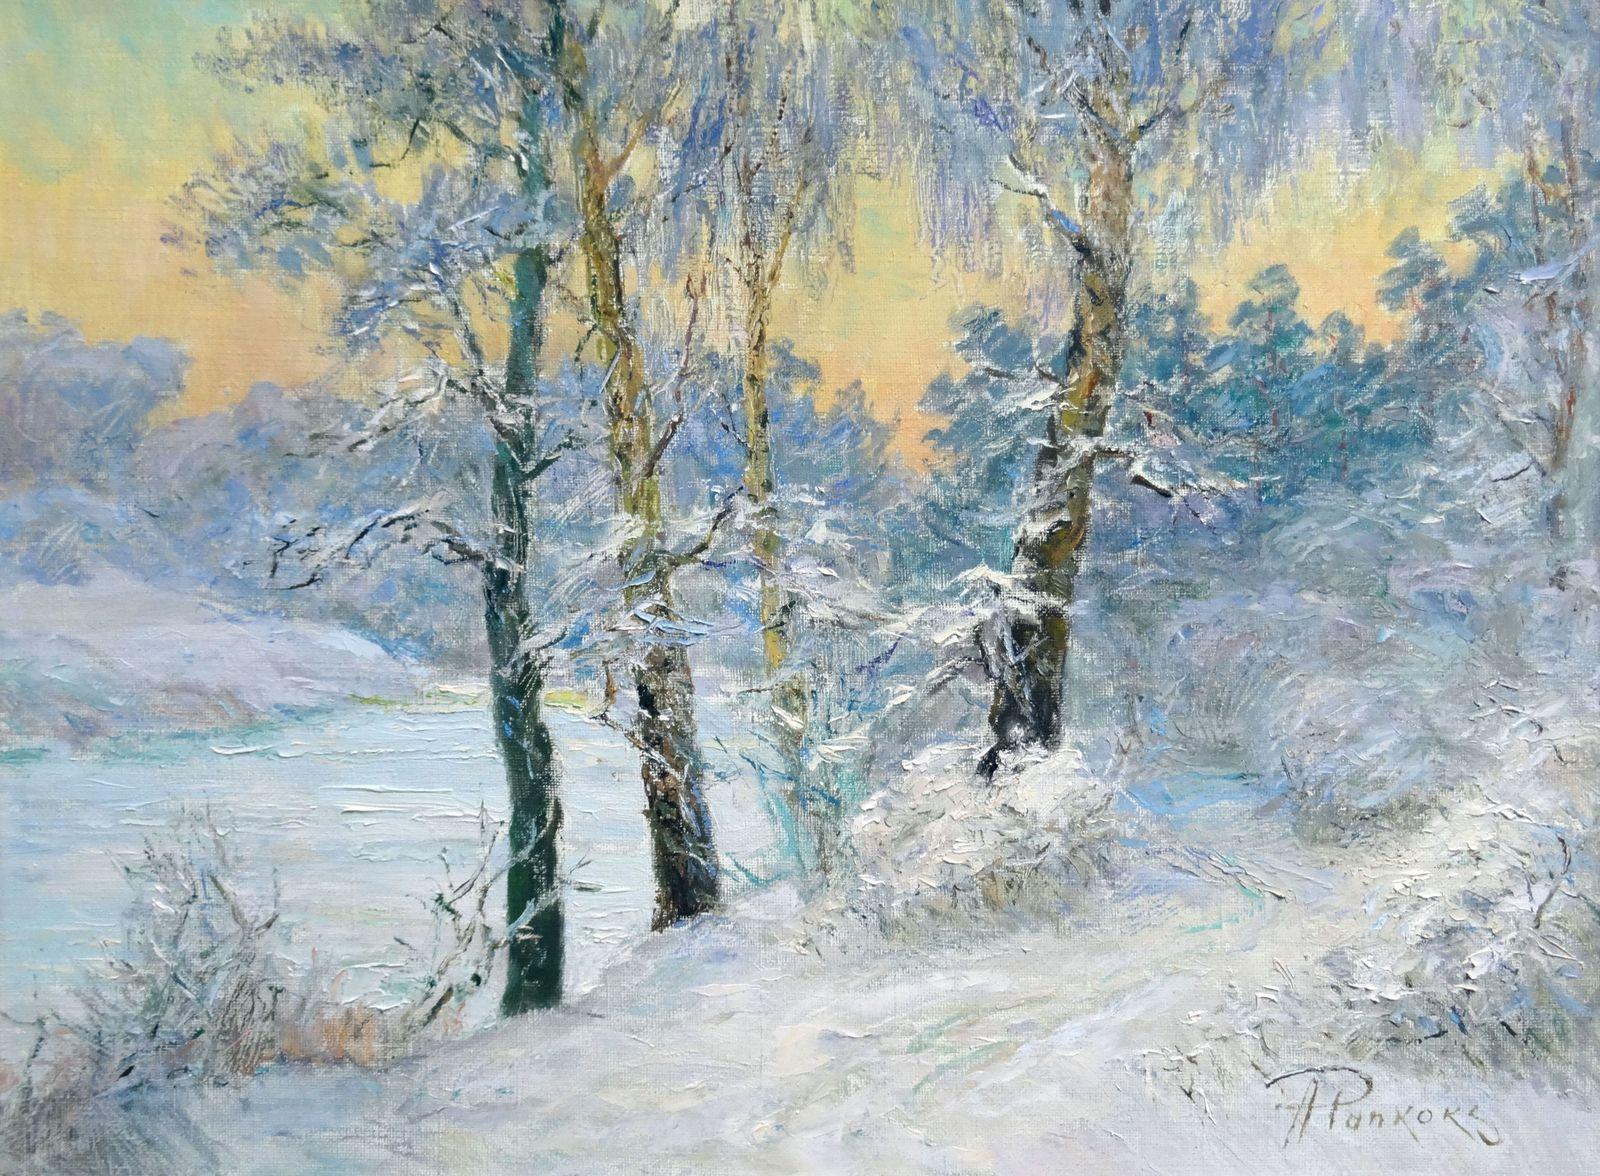 Winter. Oil on canvas, 60x80 cm